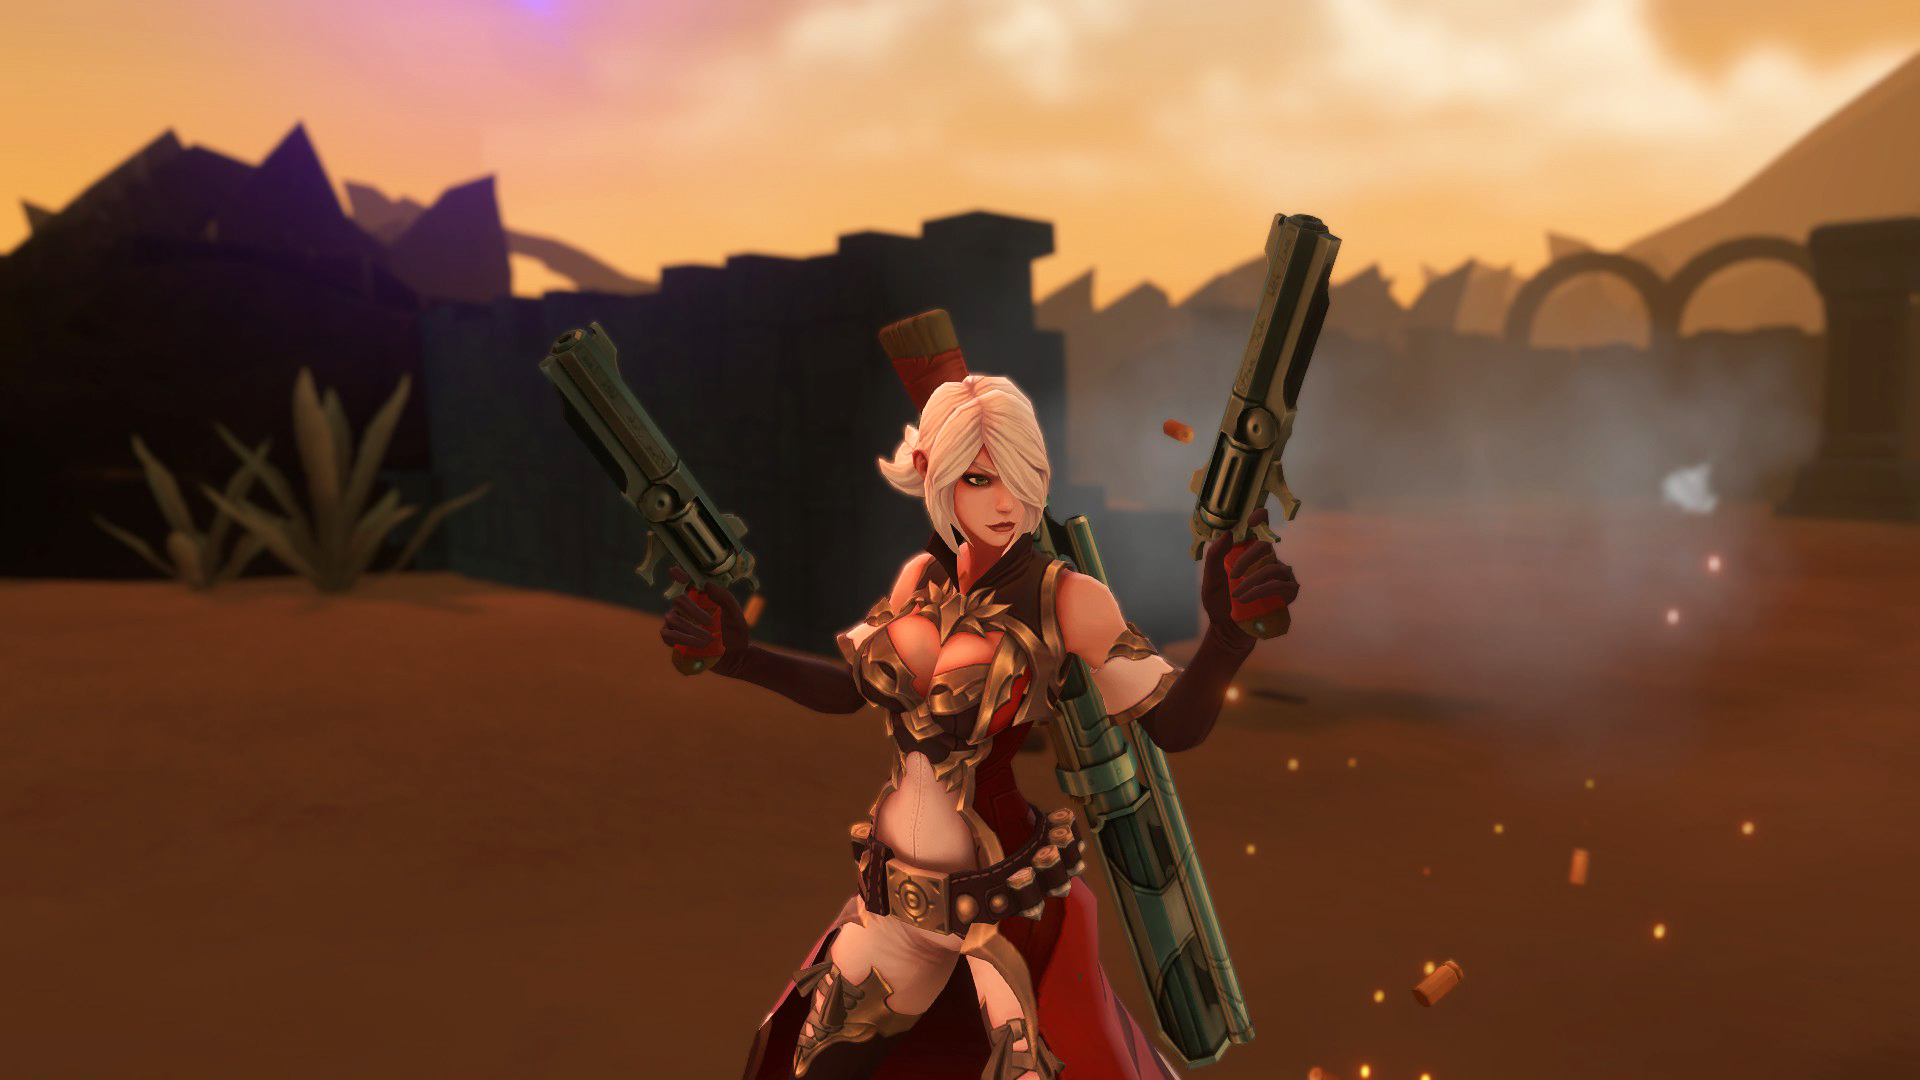 Battlerite Royale tops Steam's global top seller list